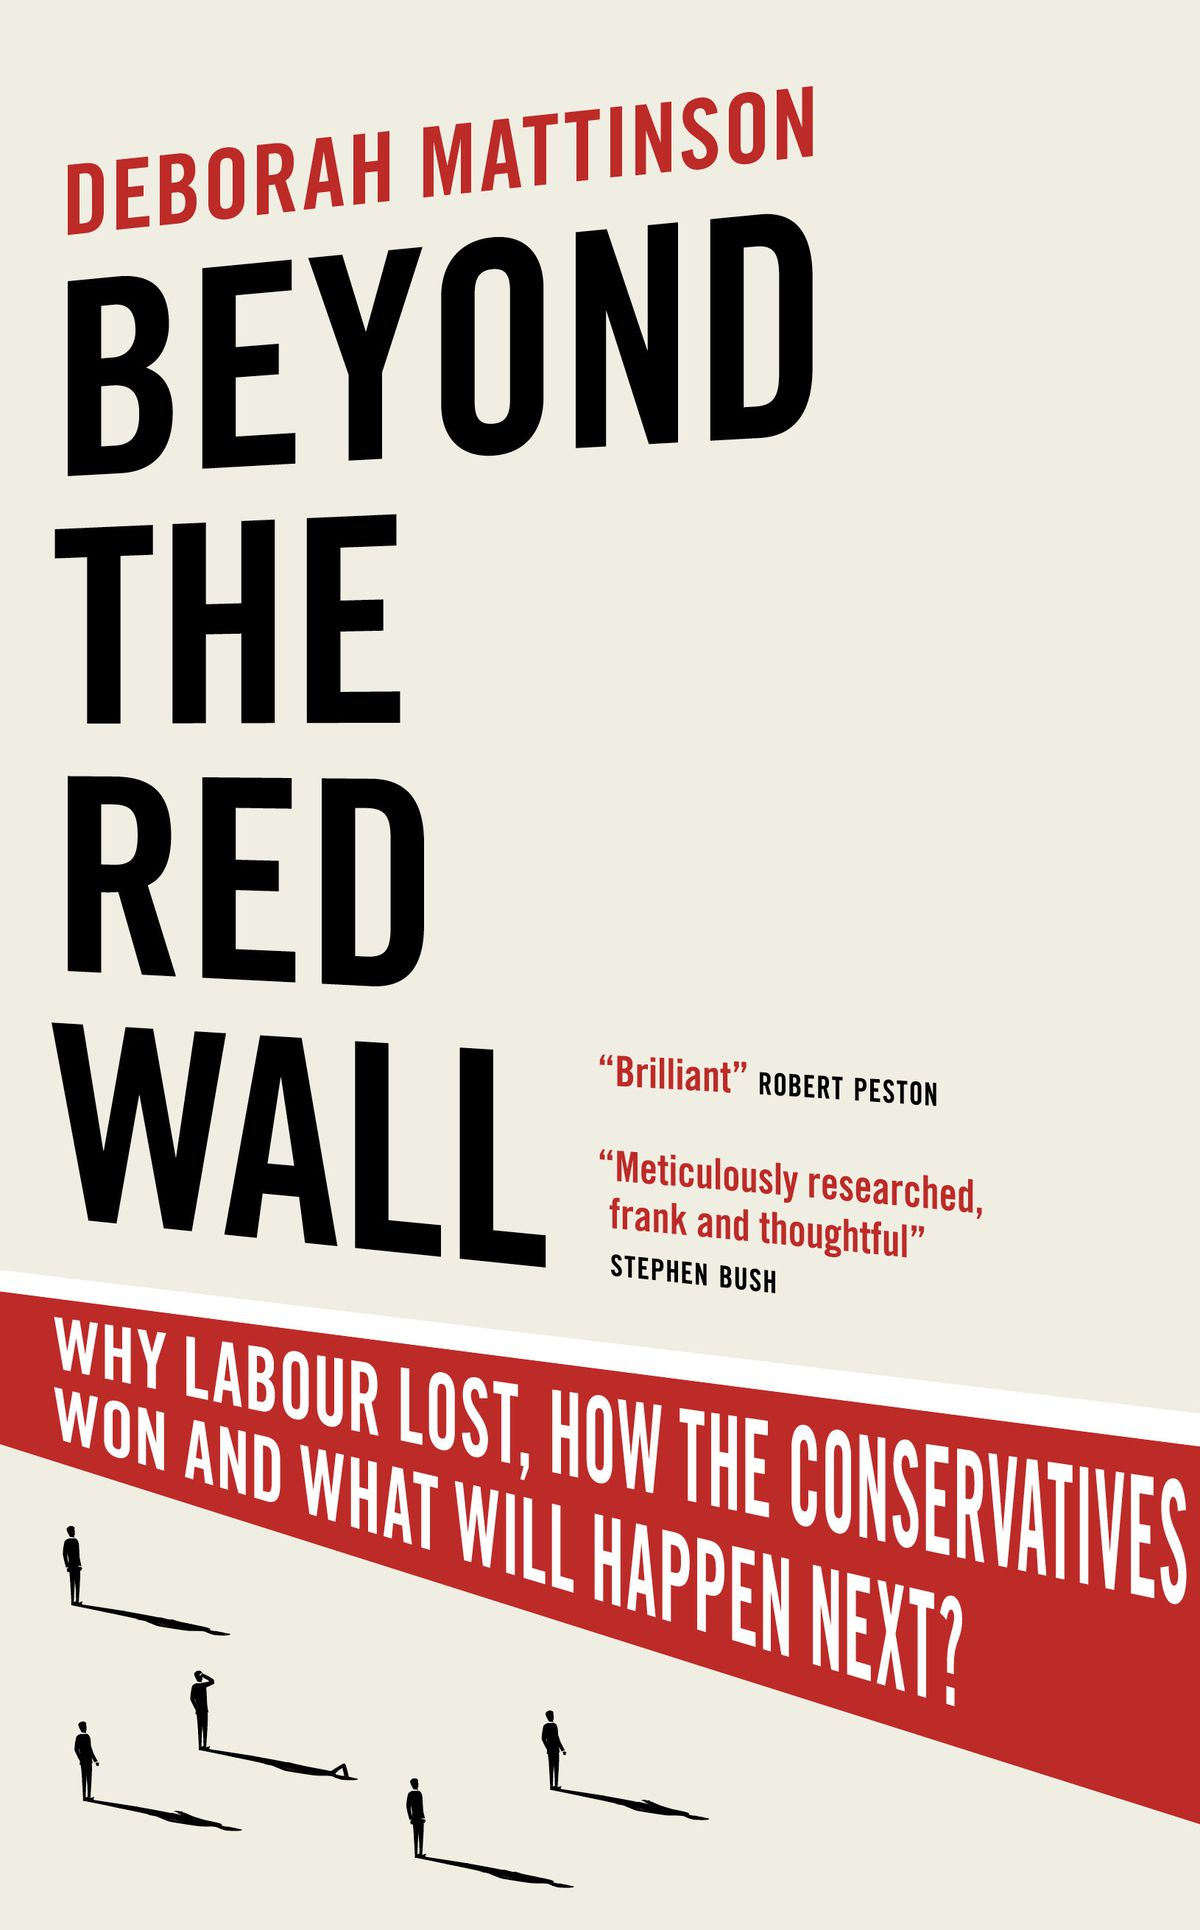 Deborah Mattinson's book Beyond The Red Wall